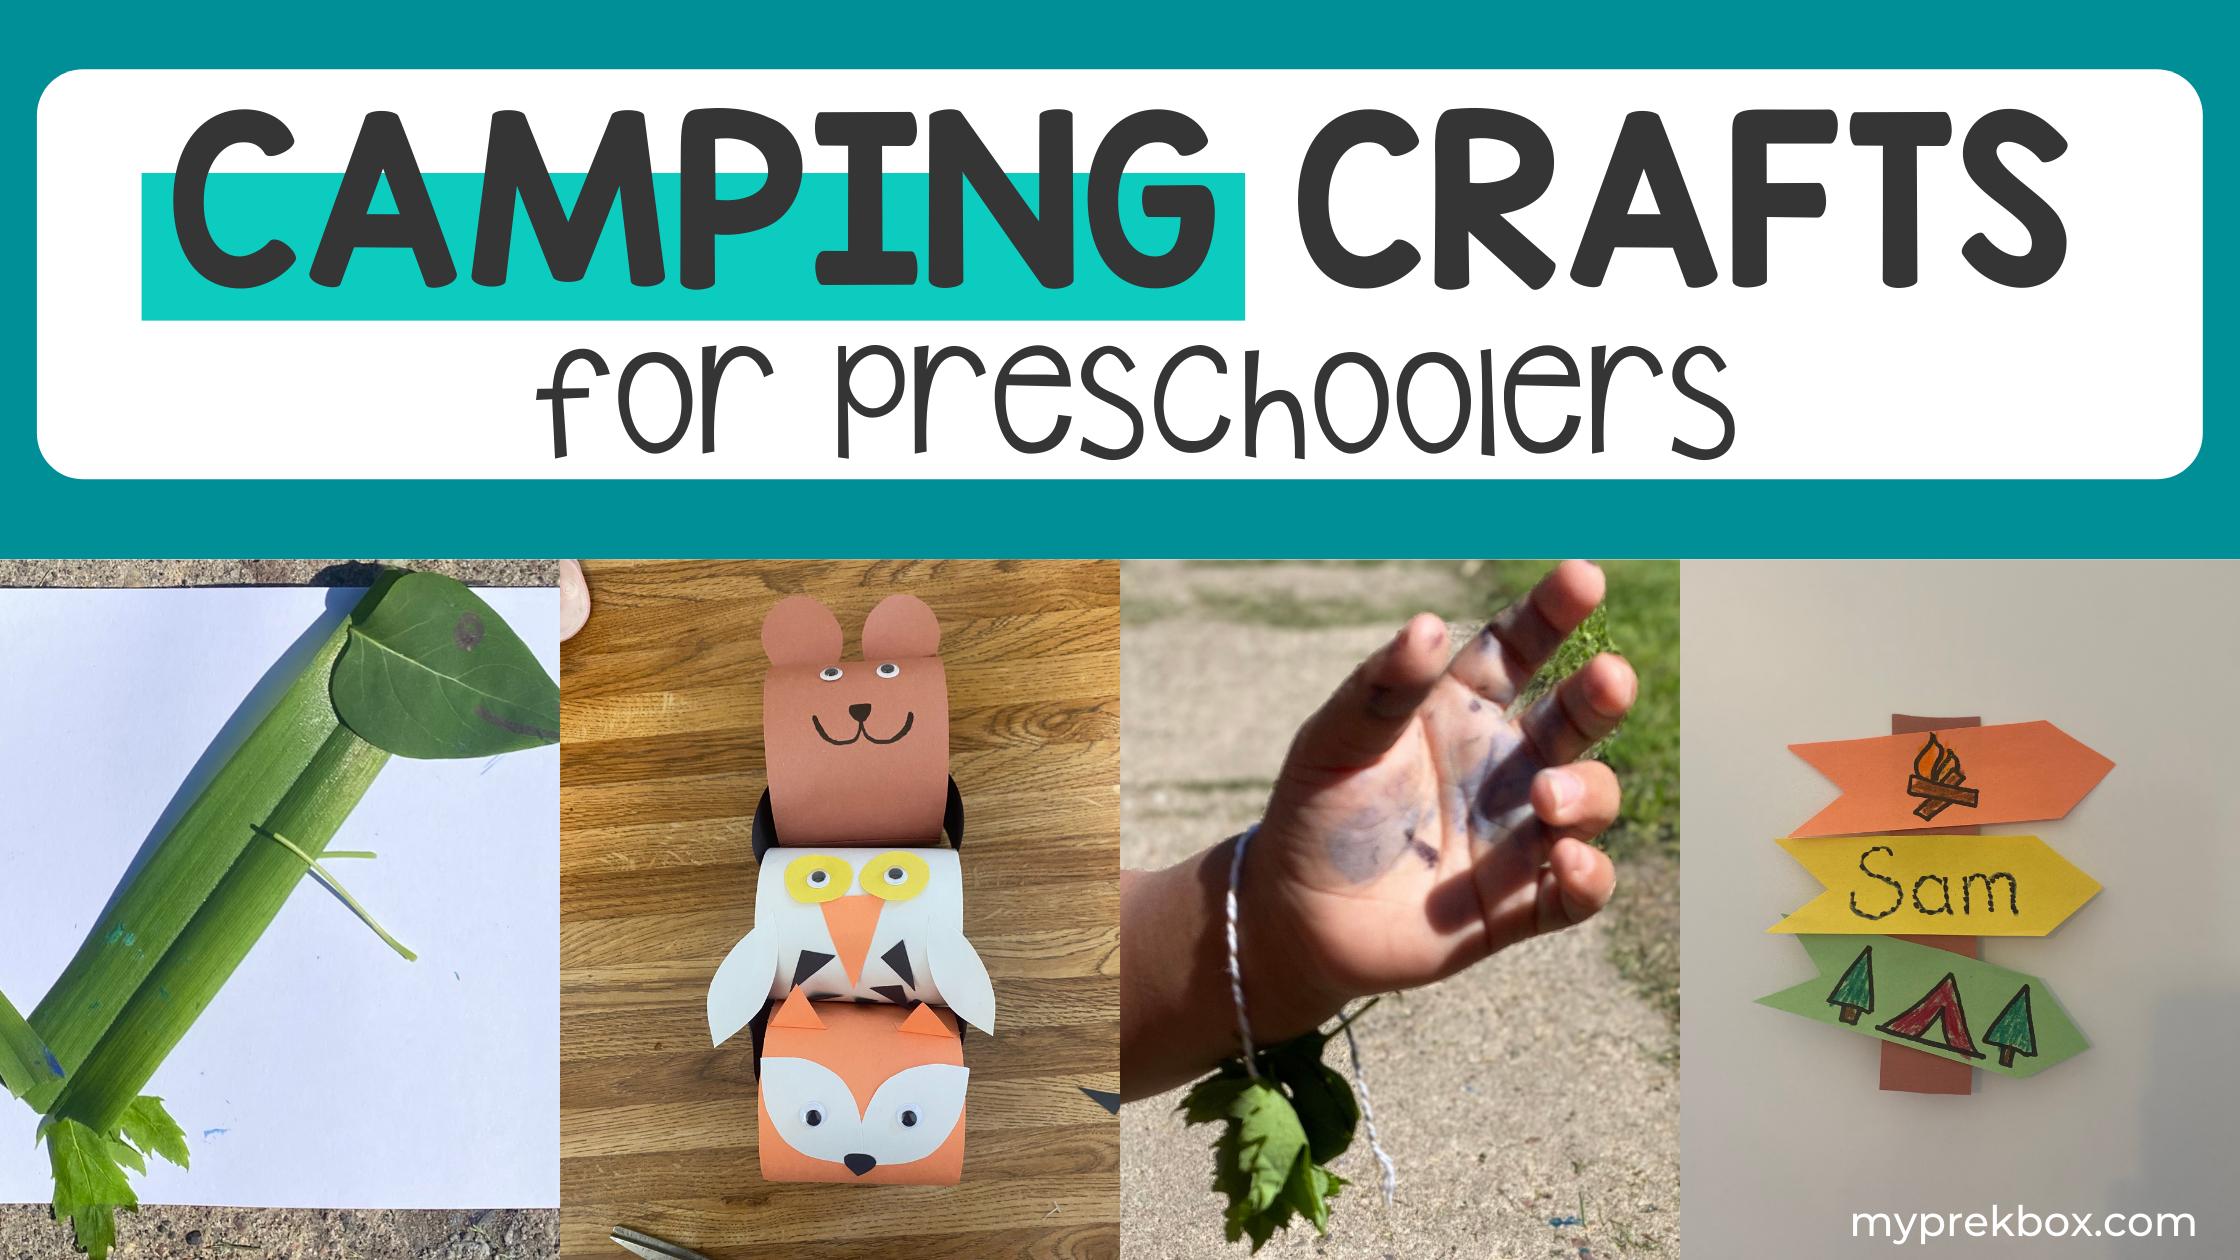 Getting Creative in Nature - Camping Art for Preschoolers